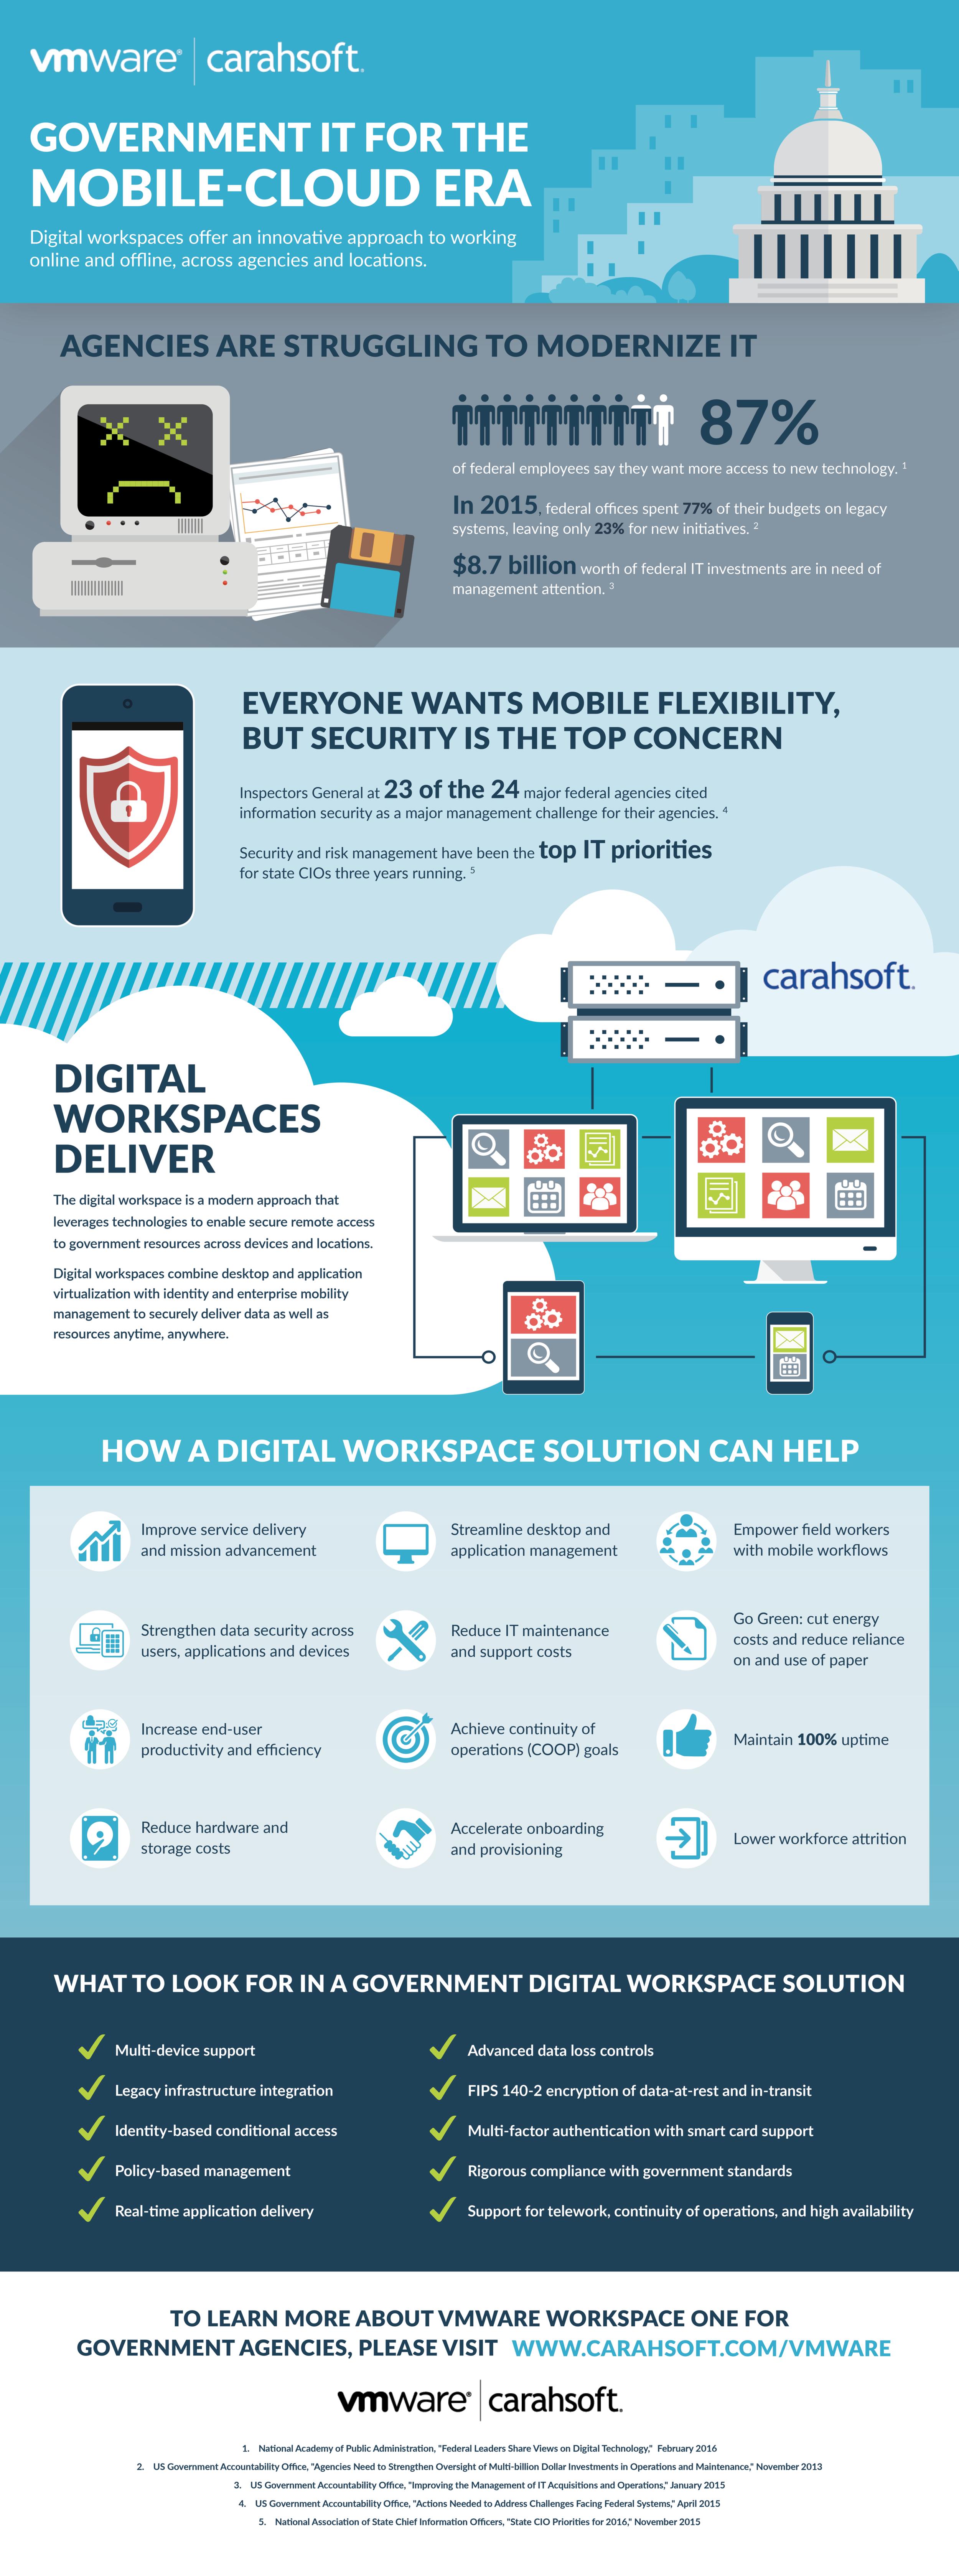 B2B_Carahsoft_Infographic_PORT.png